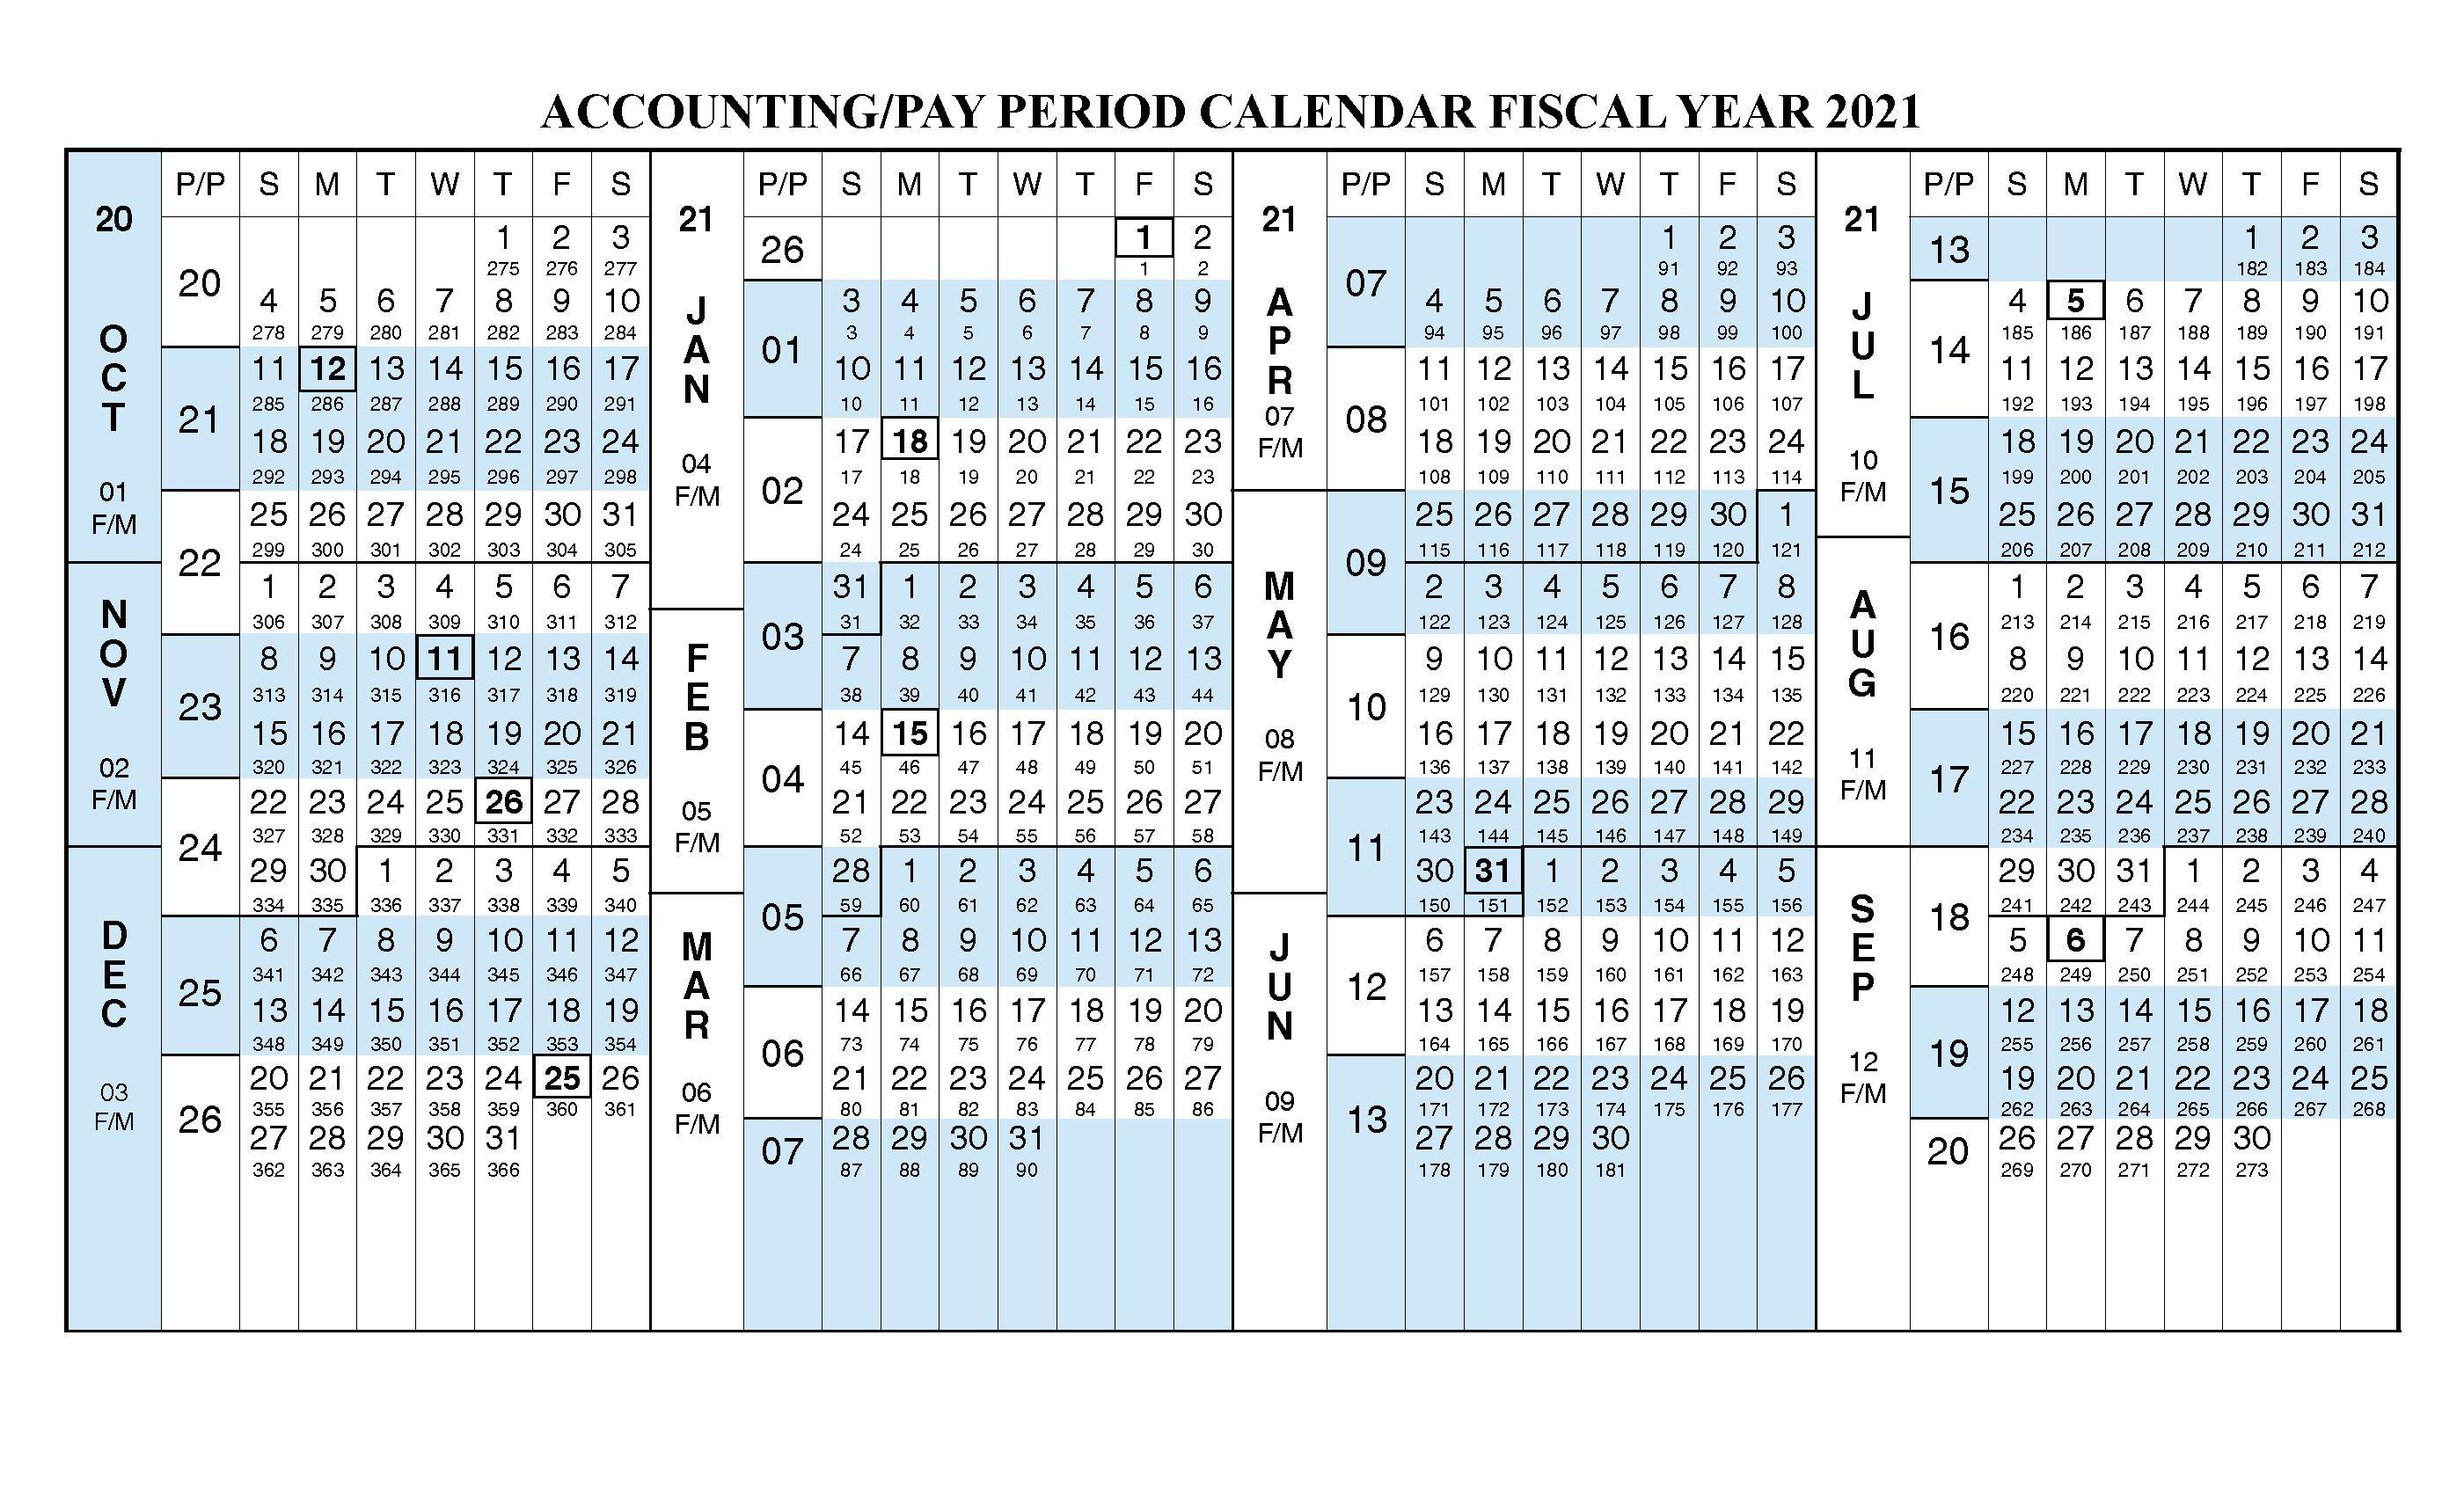 002 Top Payroll Calendar Template 2020 Example  Biweekly Schedule Excel FreeFull